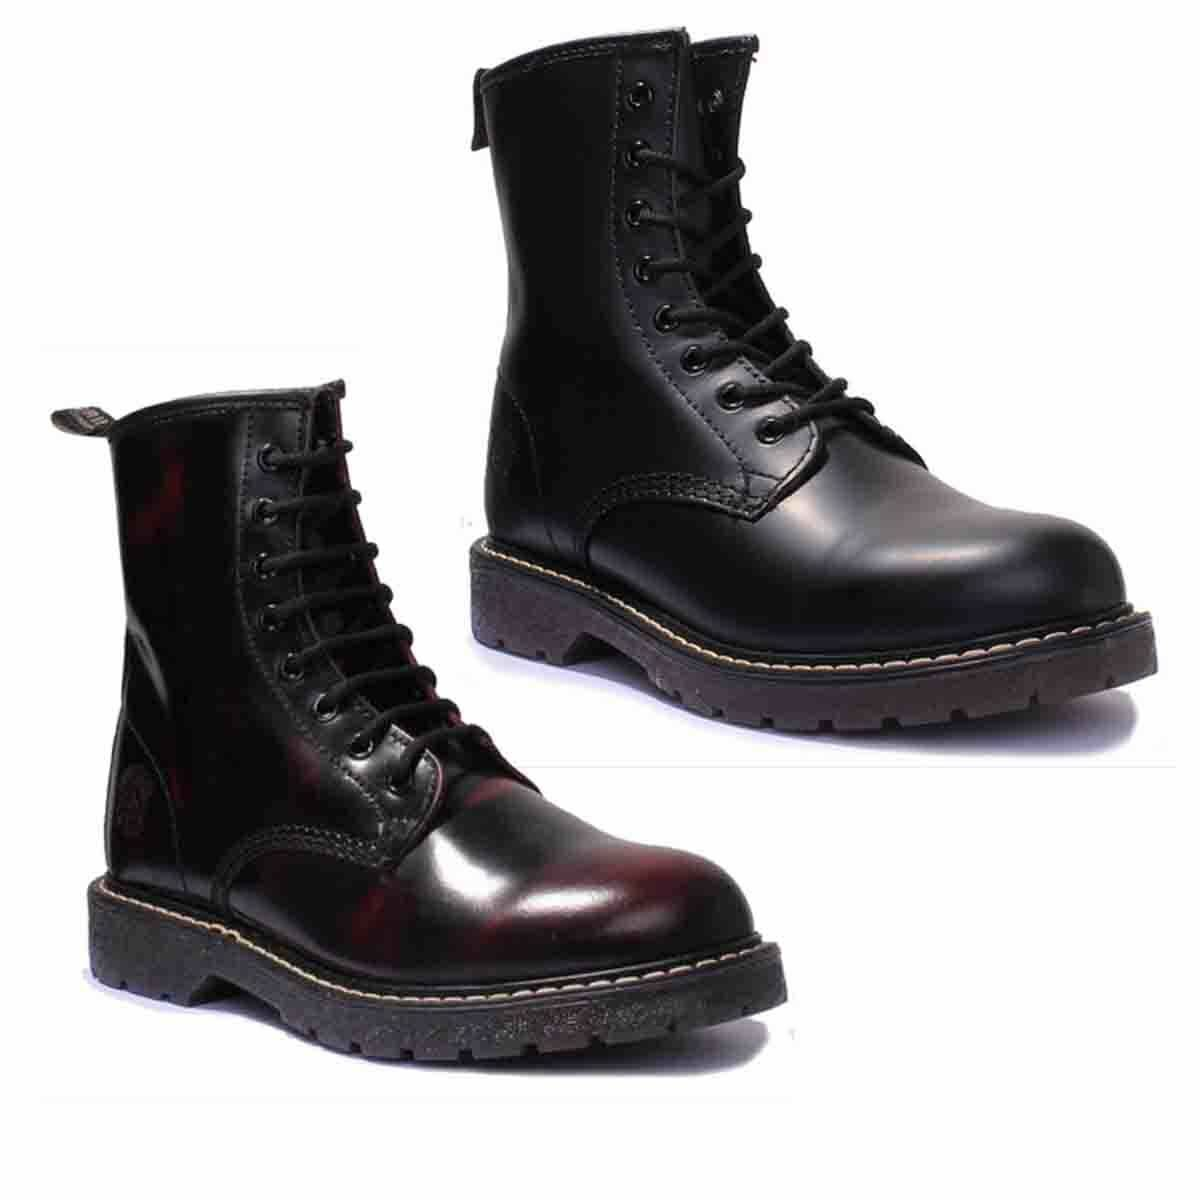 Grinders Cedric Unisex Leather Matt Burgundy Rub Off Ankle Boots